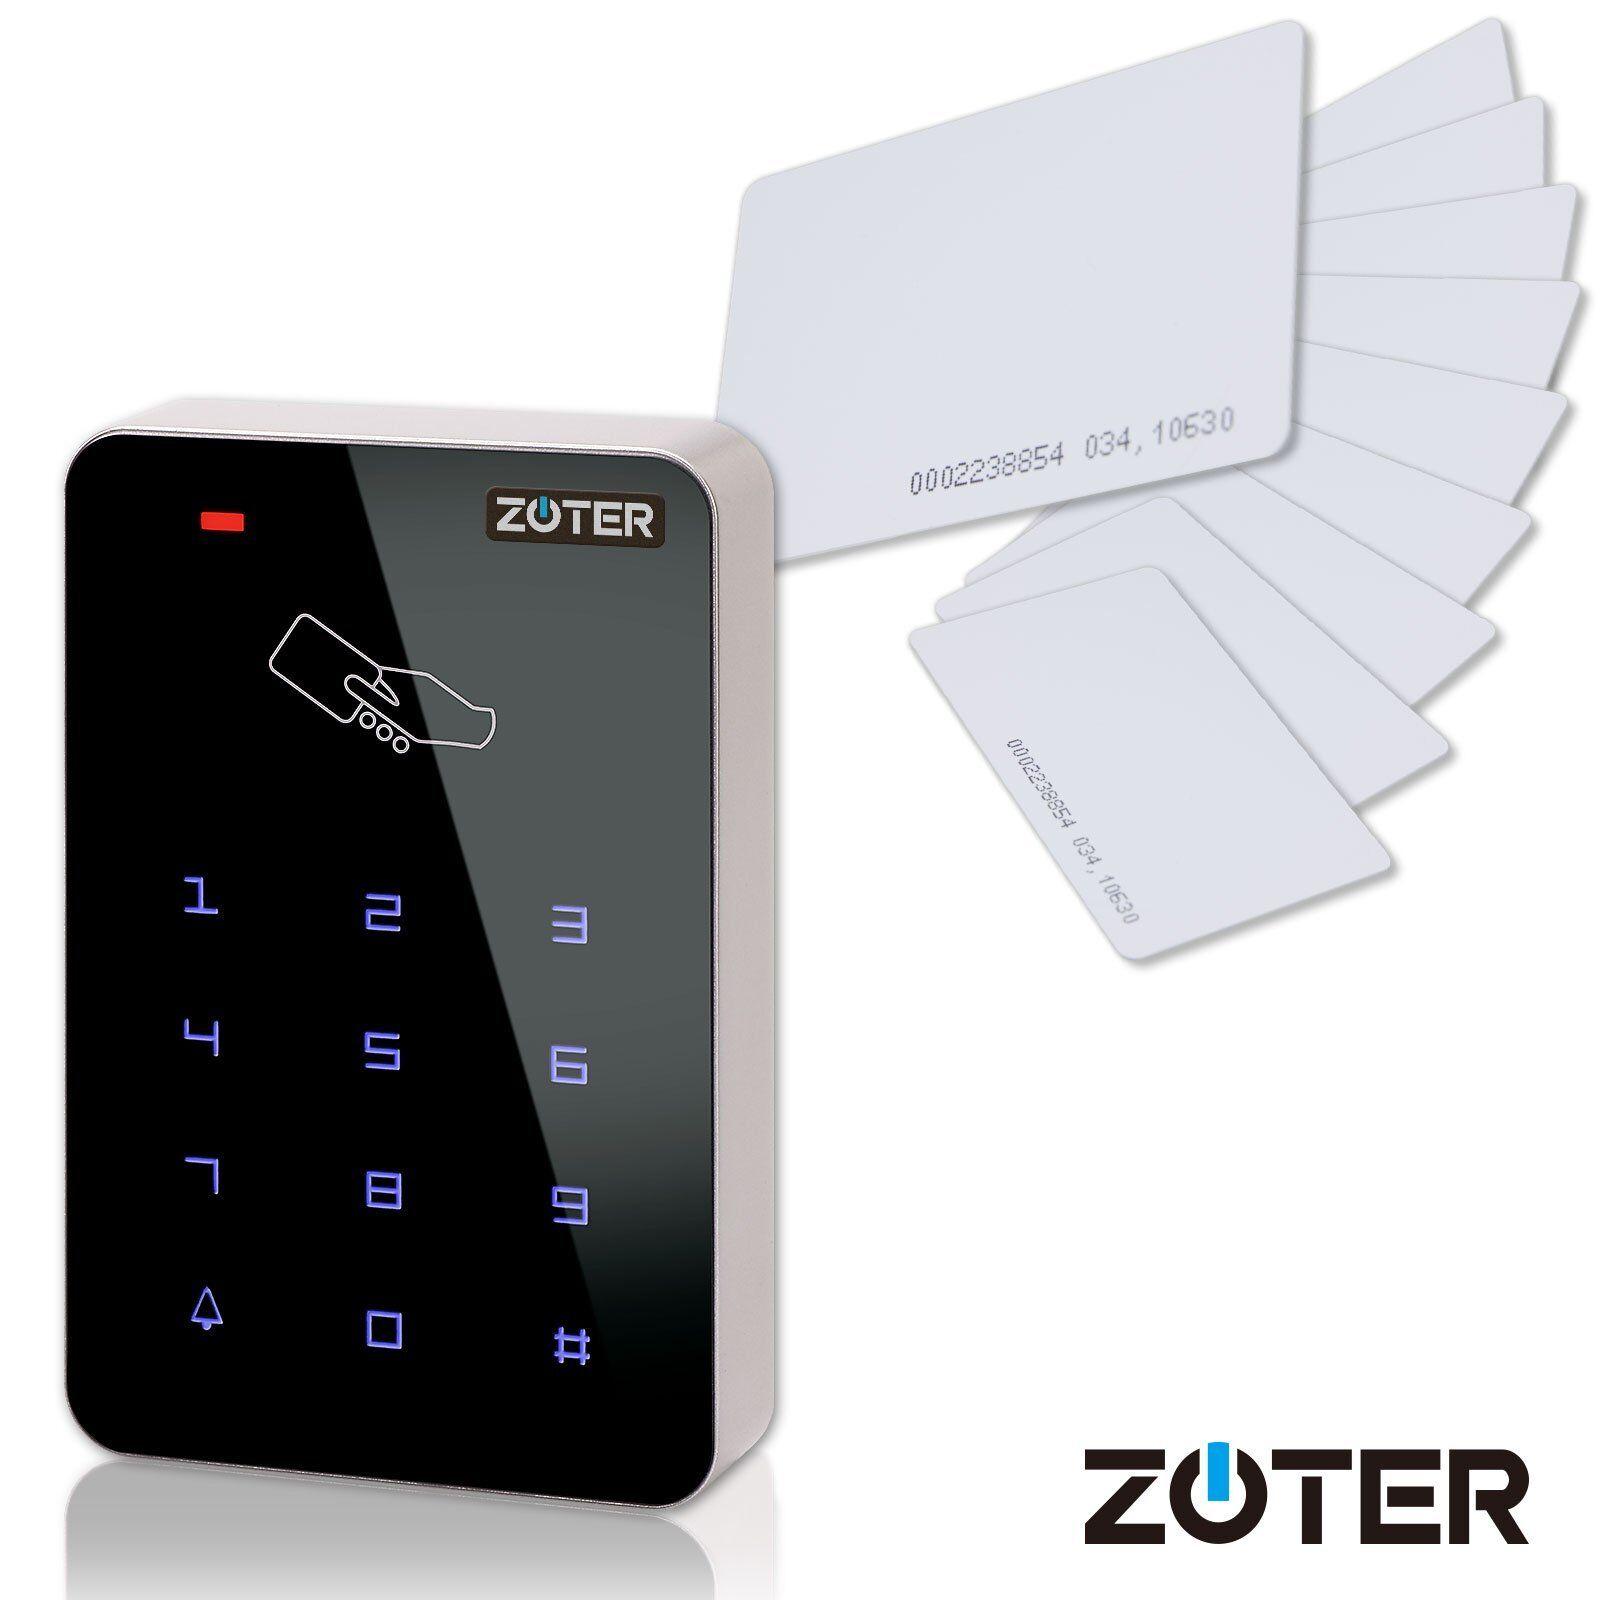 Door Home Access Control 125khz Reader Keypad Backlit Key RFID Card for House   eBay  sc 1 st  eBay & Door Home Access Control 125khz Reader Keypad Backlit Key RFID ... pezcame.com